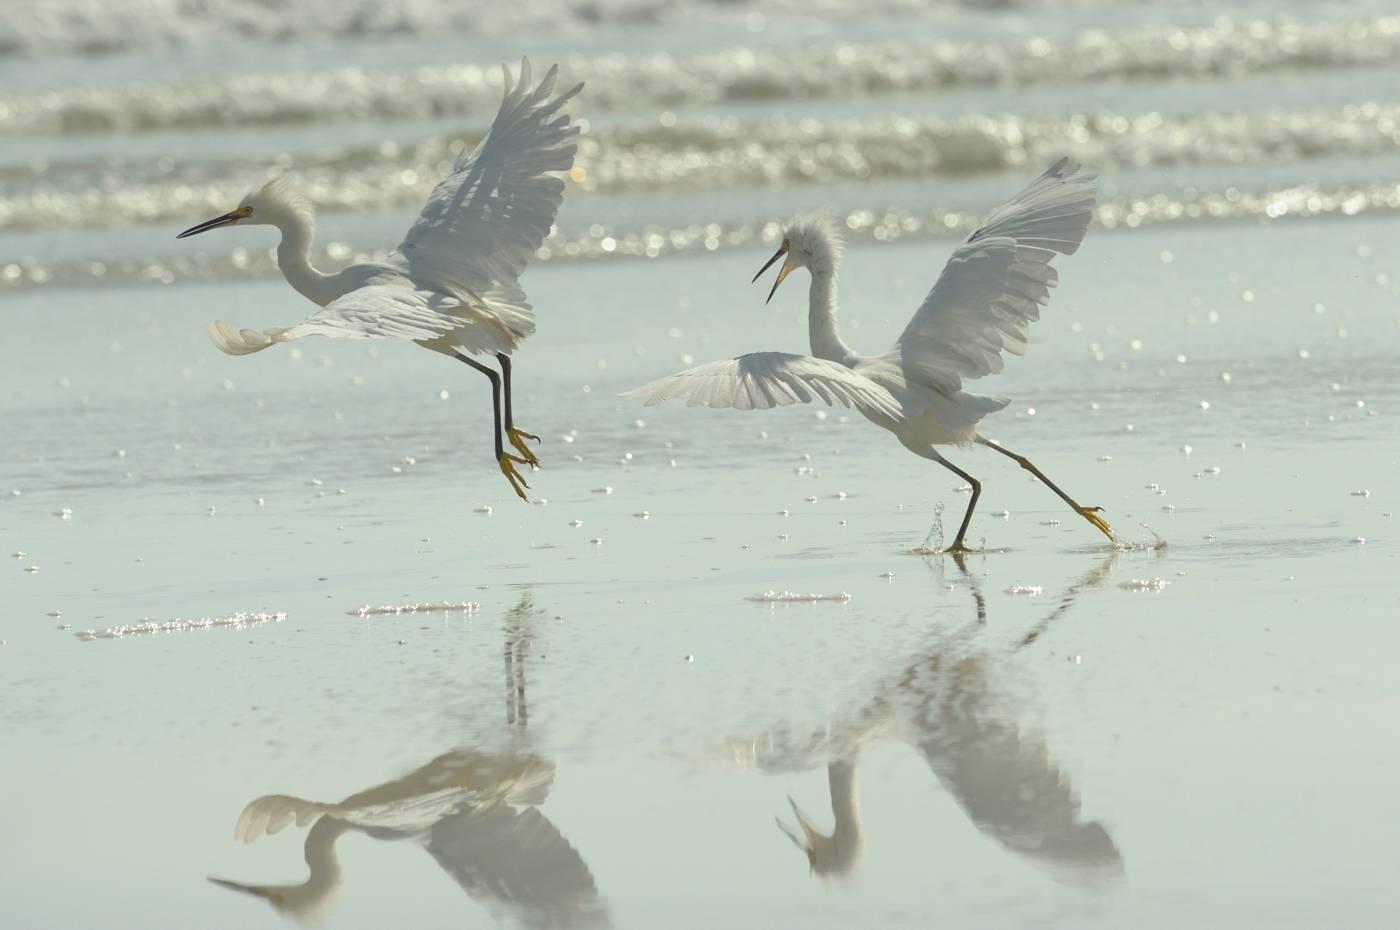 Aigrette neigeuse - Snowy egret  4